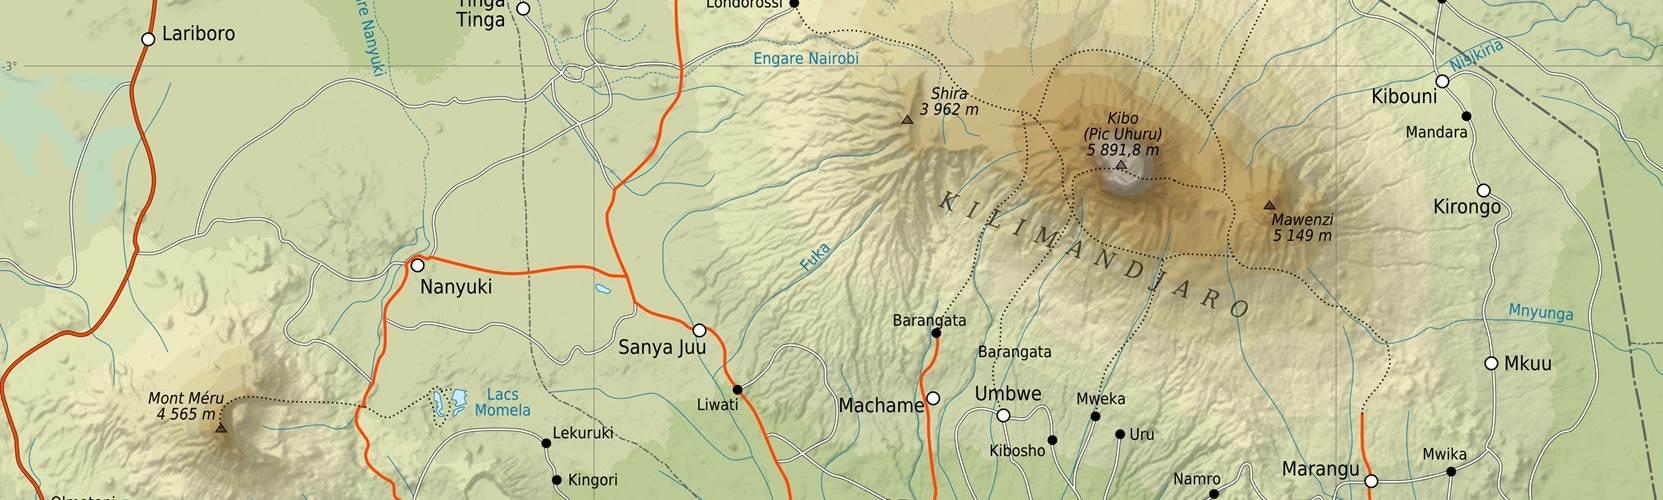 kilimanjarobooks and maps. further reading books and maps for mount kilimanjaro  adventure